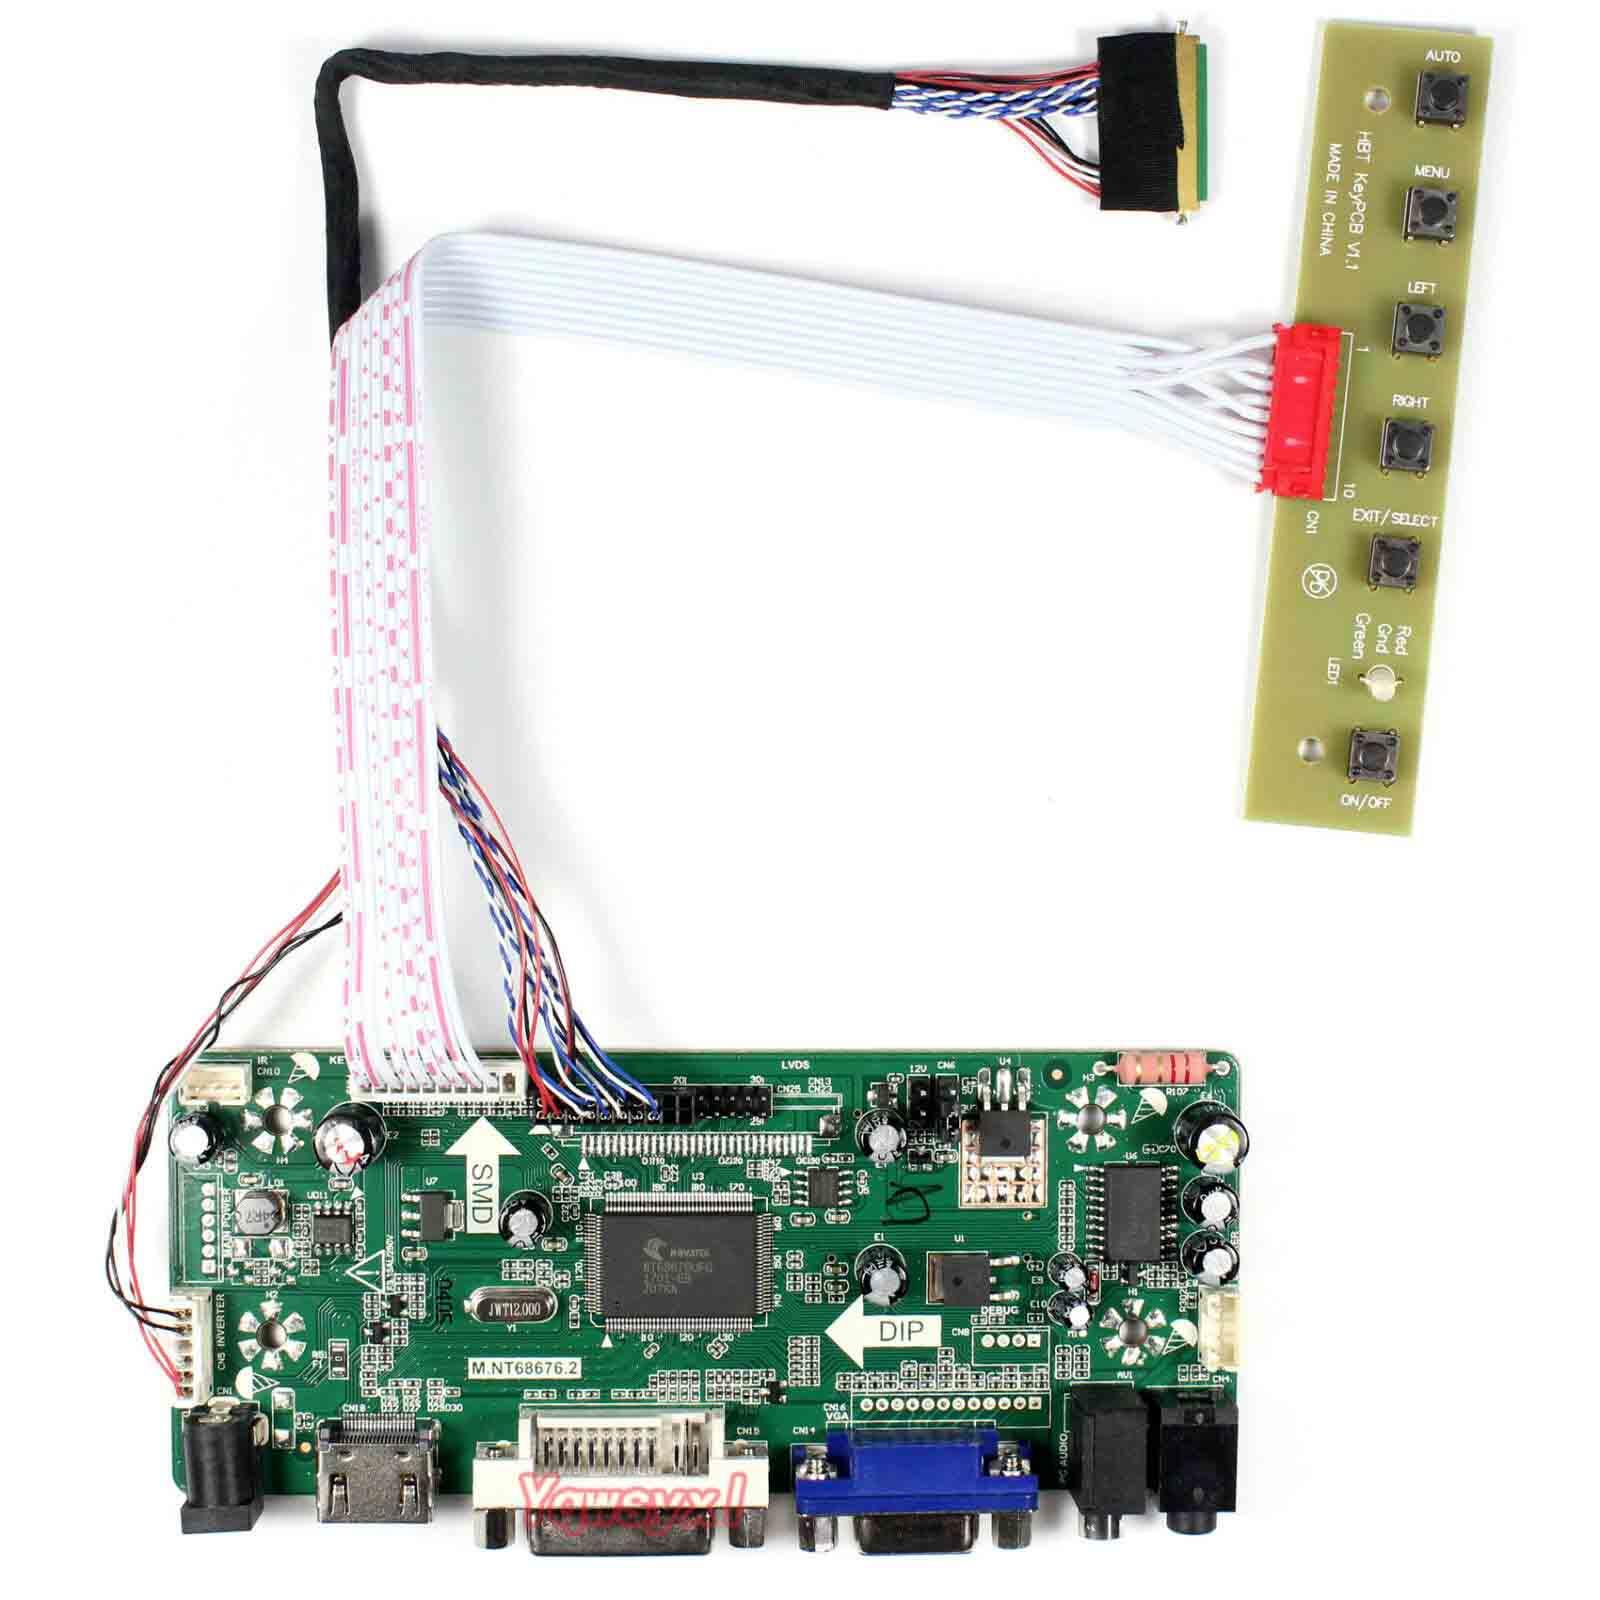 Yqwsyxl Control Board Monitor Kit For N156BGE-L21  HDMI + DVI + VGA LCD LED  Screen Controller Board Driver